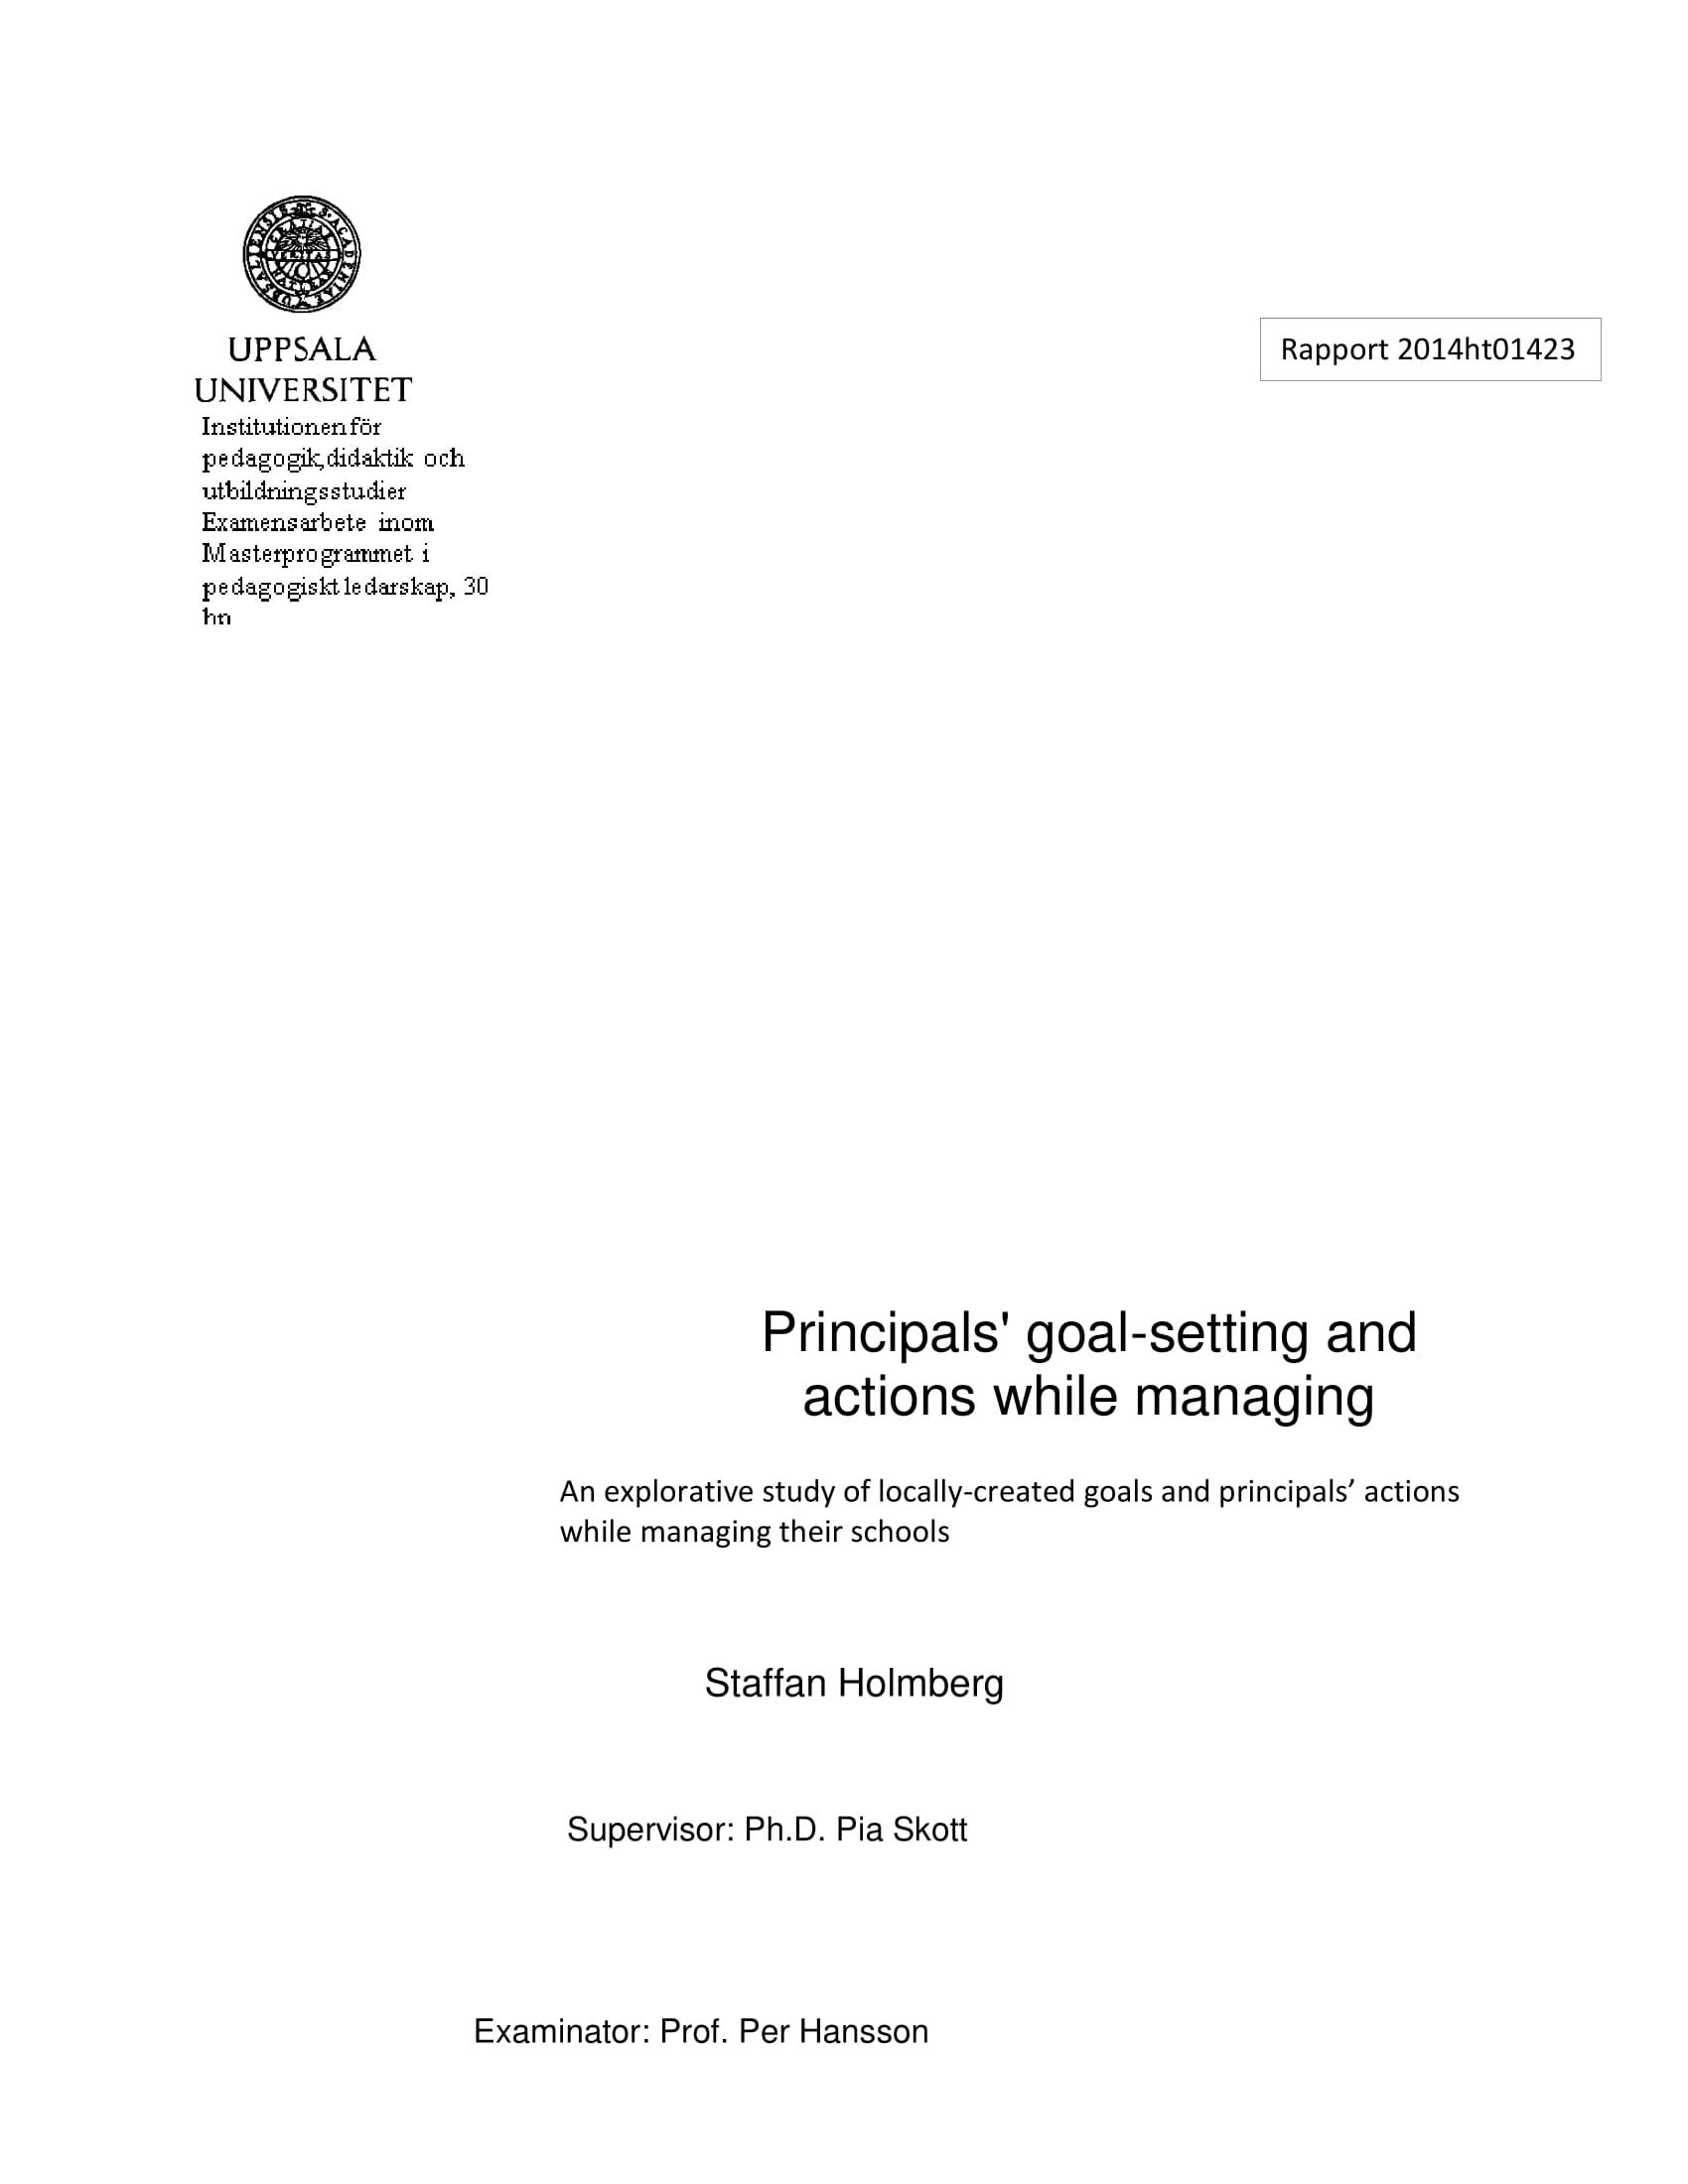 principals goal setting example